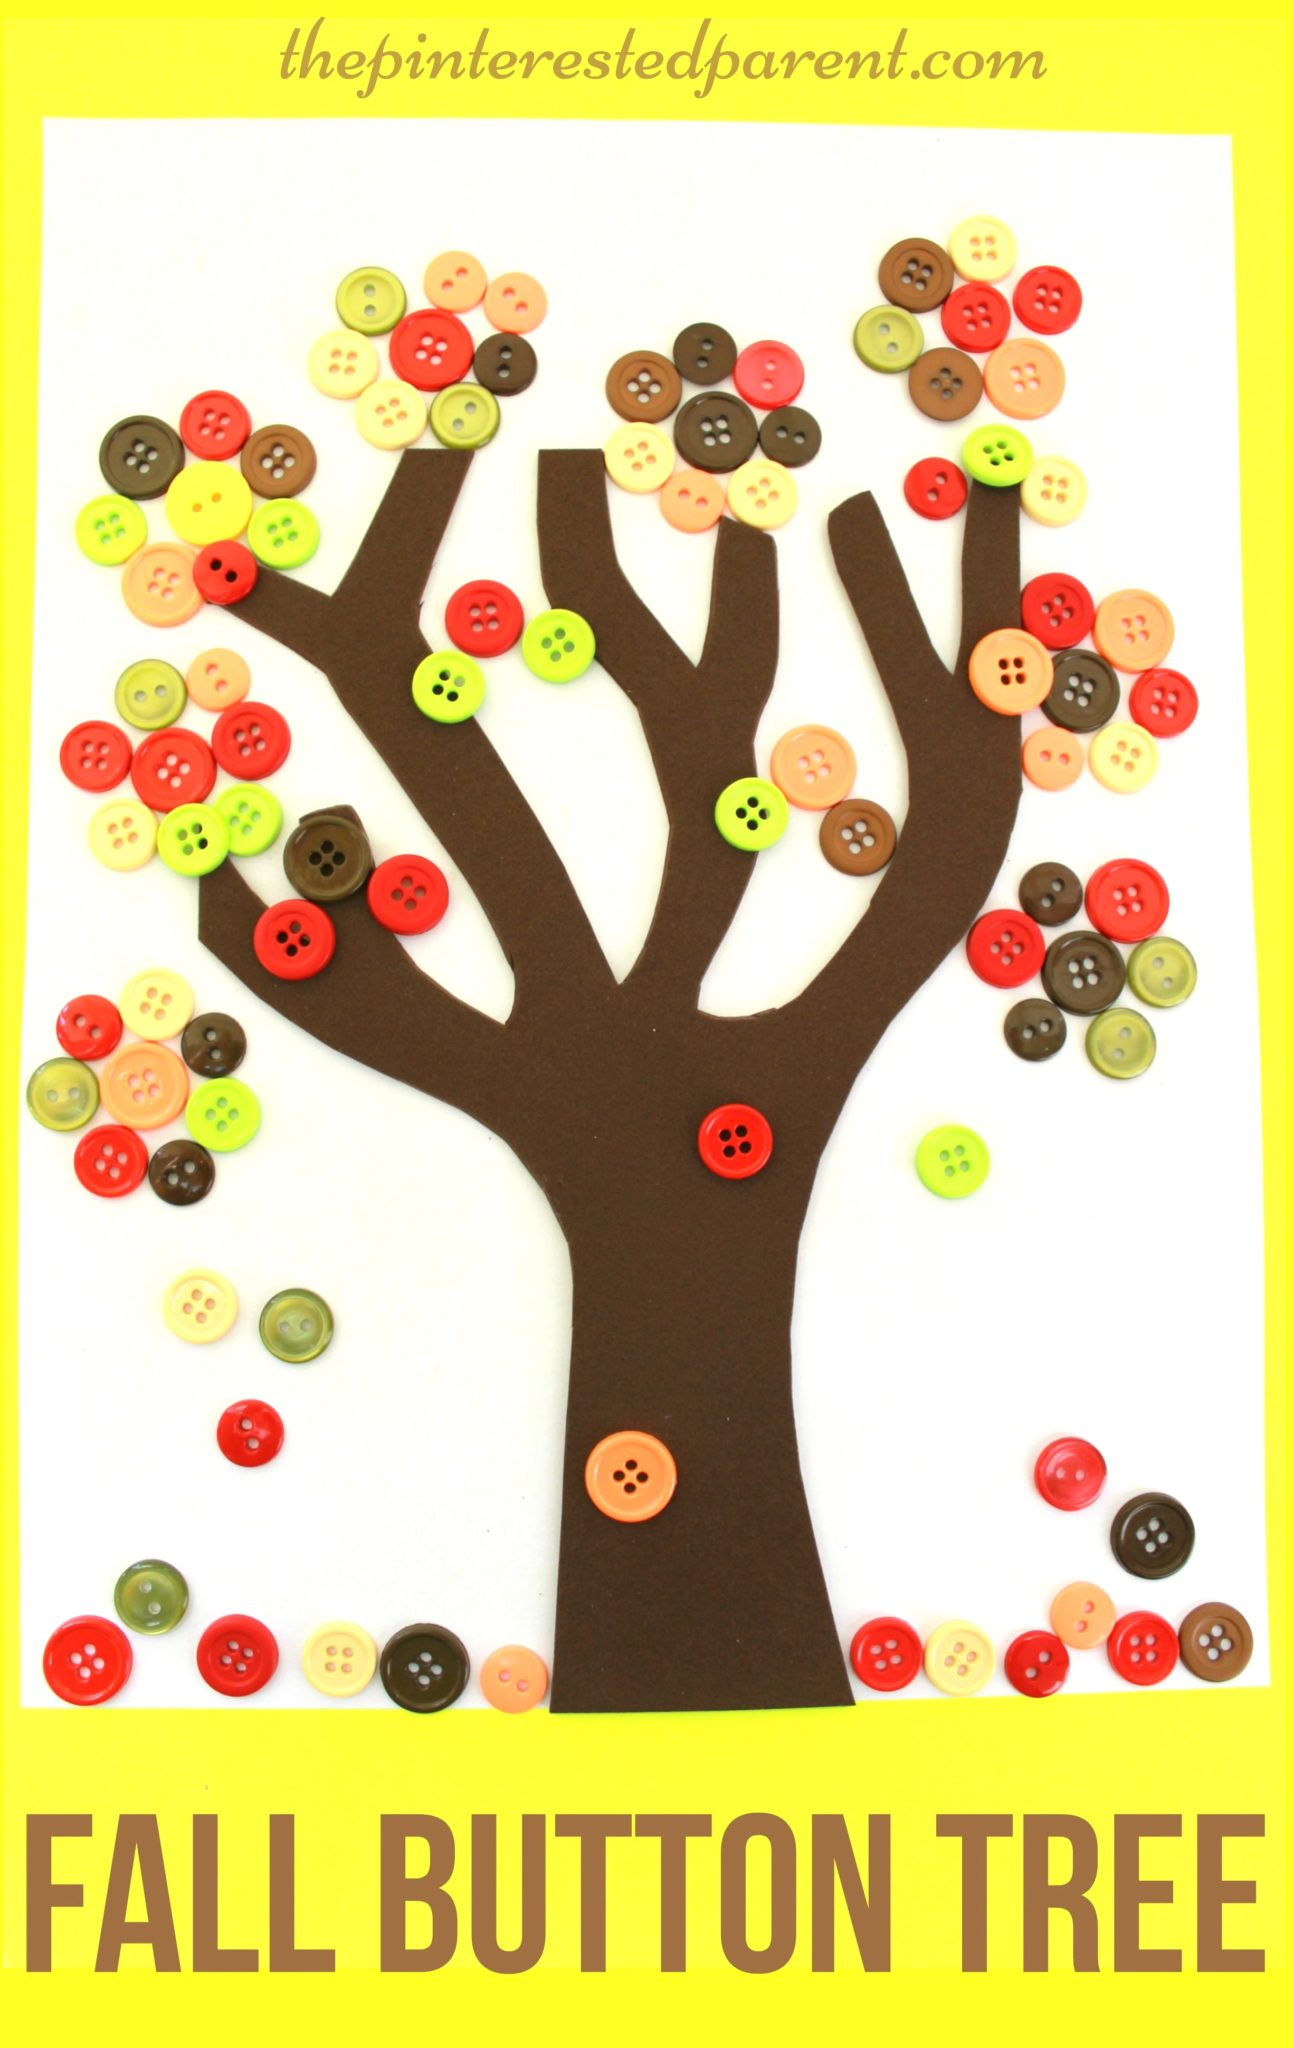 Autumn Button Tree The Pinterested Parent